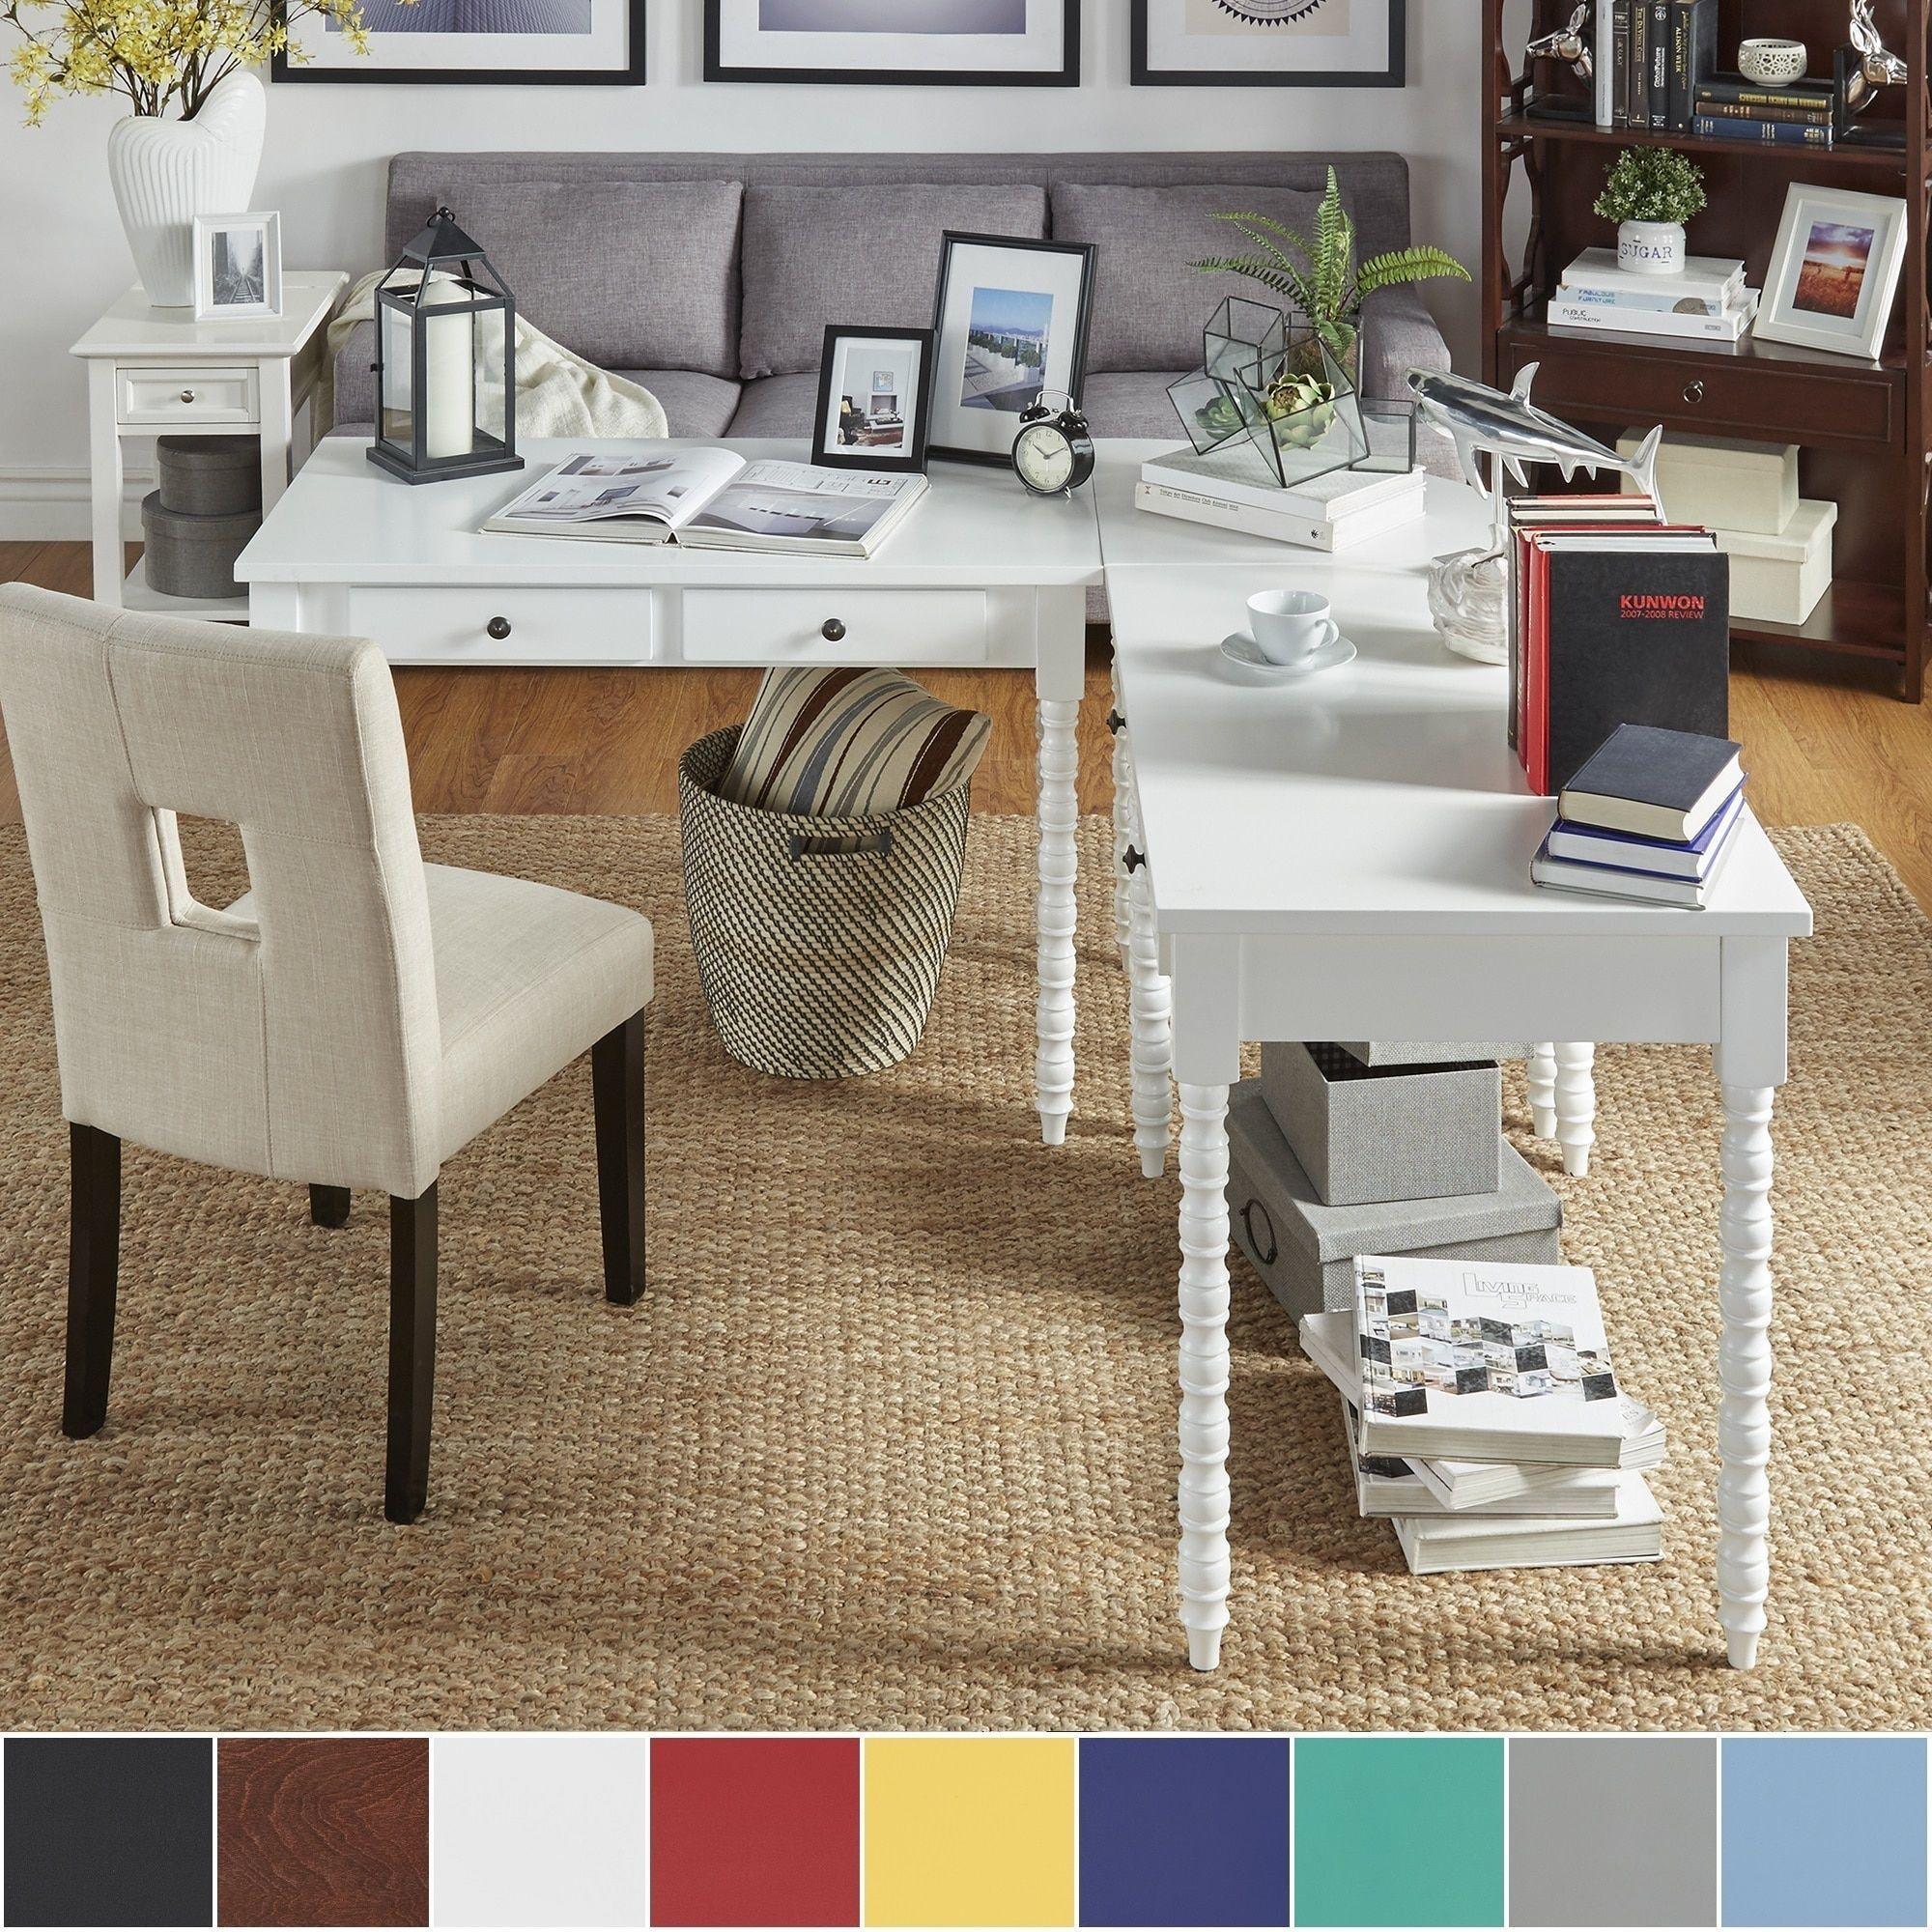 Overstock Office Furniture: Corner Desks Home Office Furniture : Free Shipping On